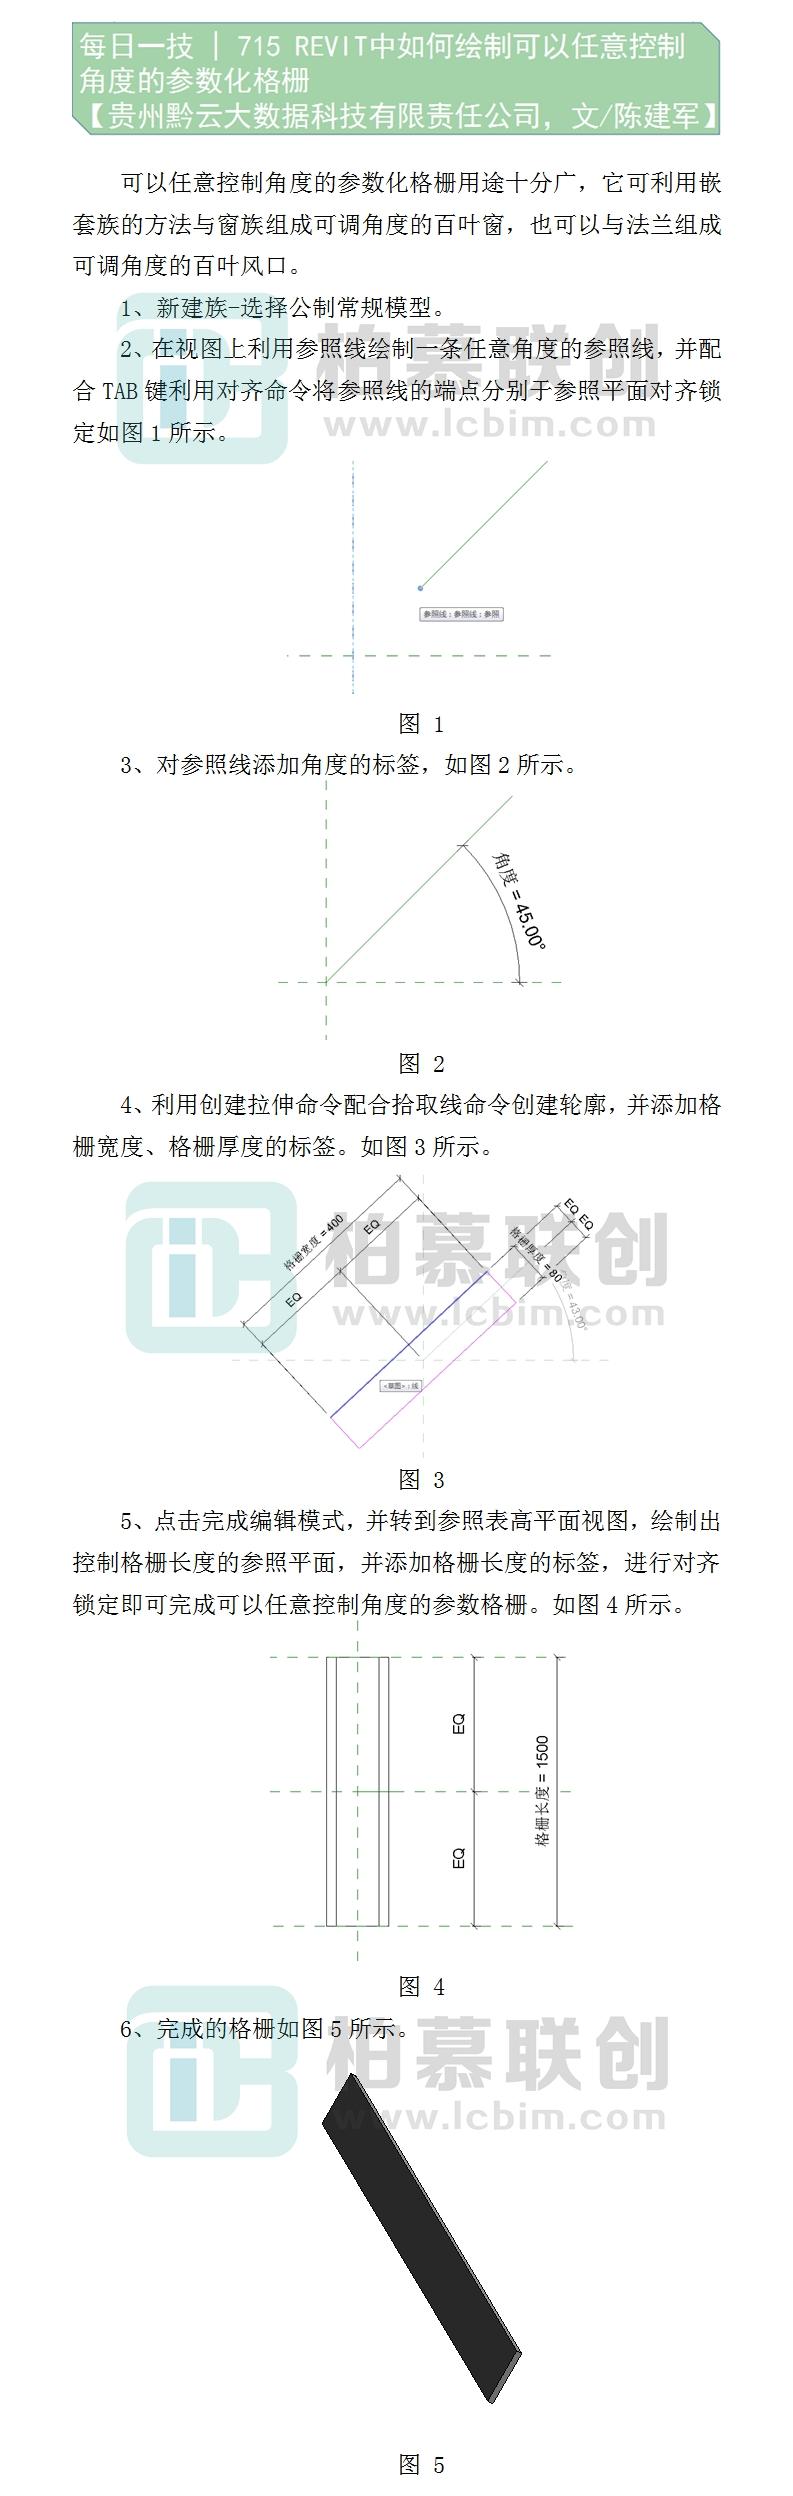 715    REVIT中如何绘制可以任意控制角度的参数化格栅--陈建军-贵州黔云大数据科技有限责任公司.jpg